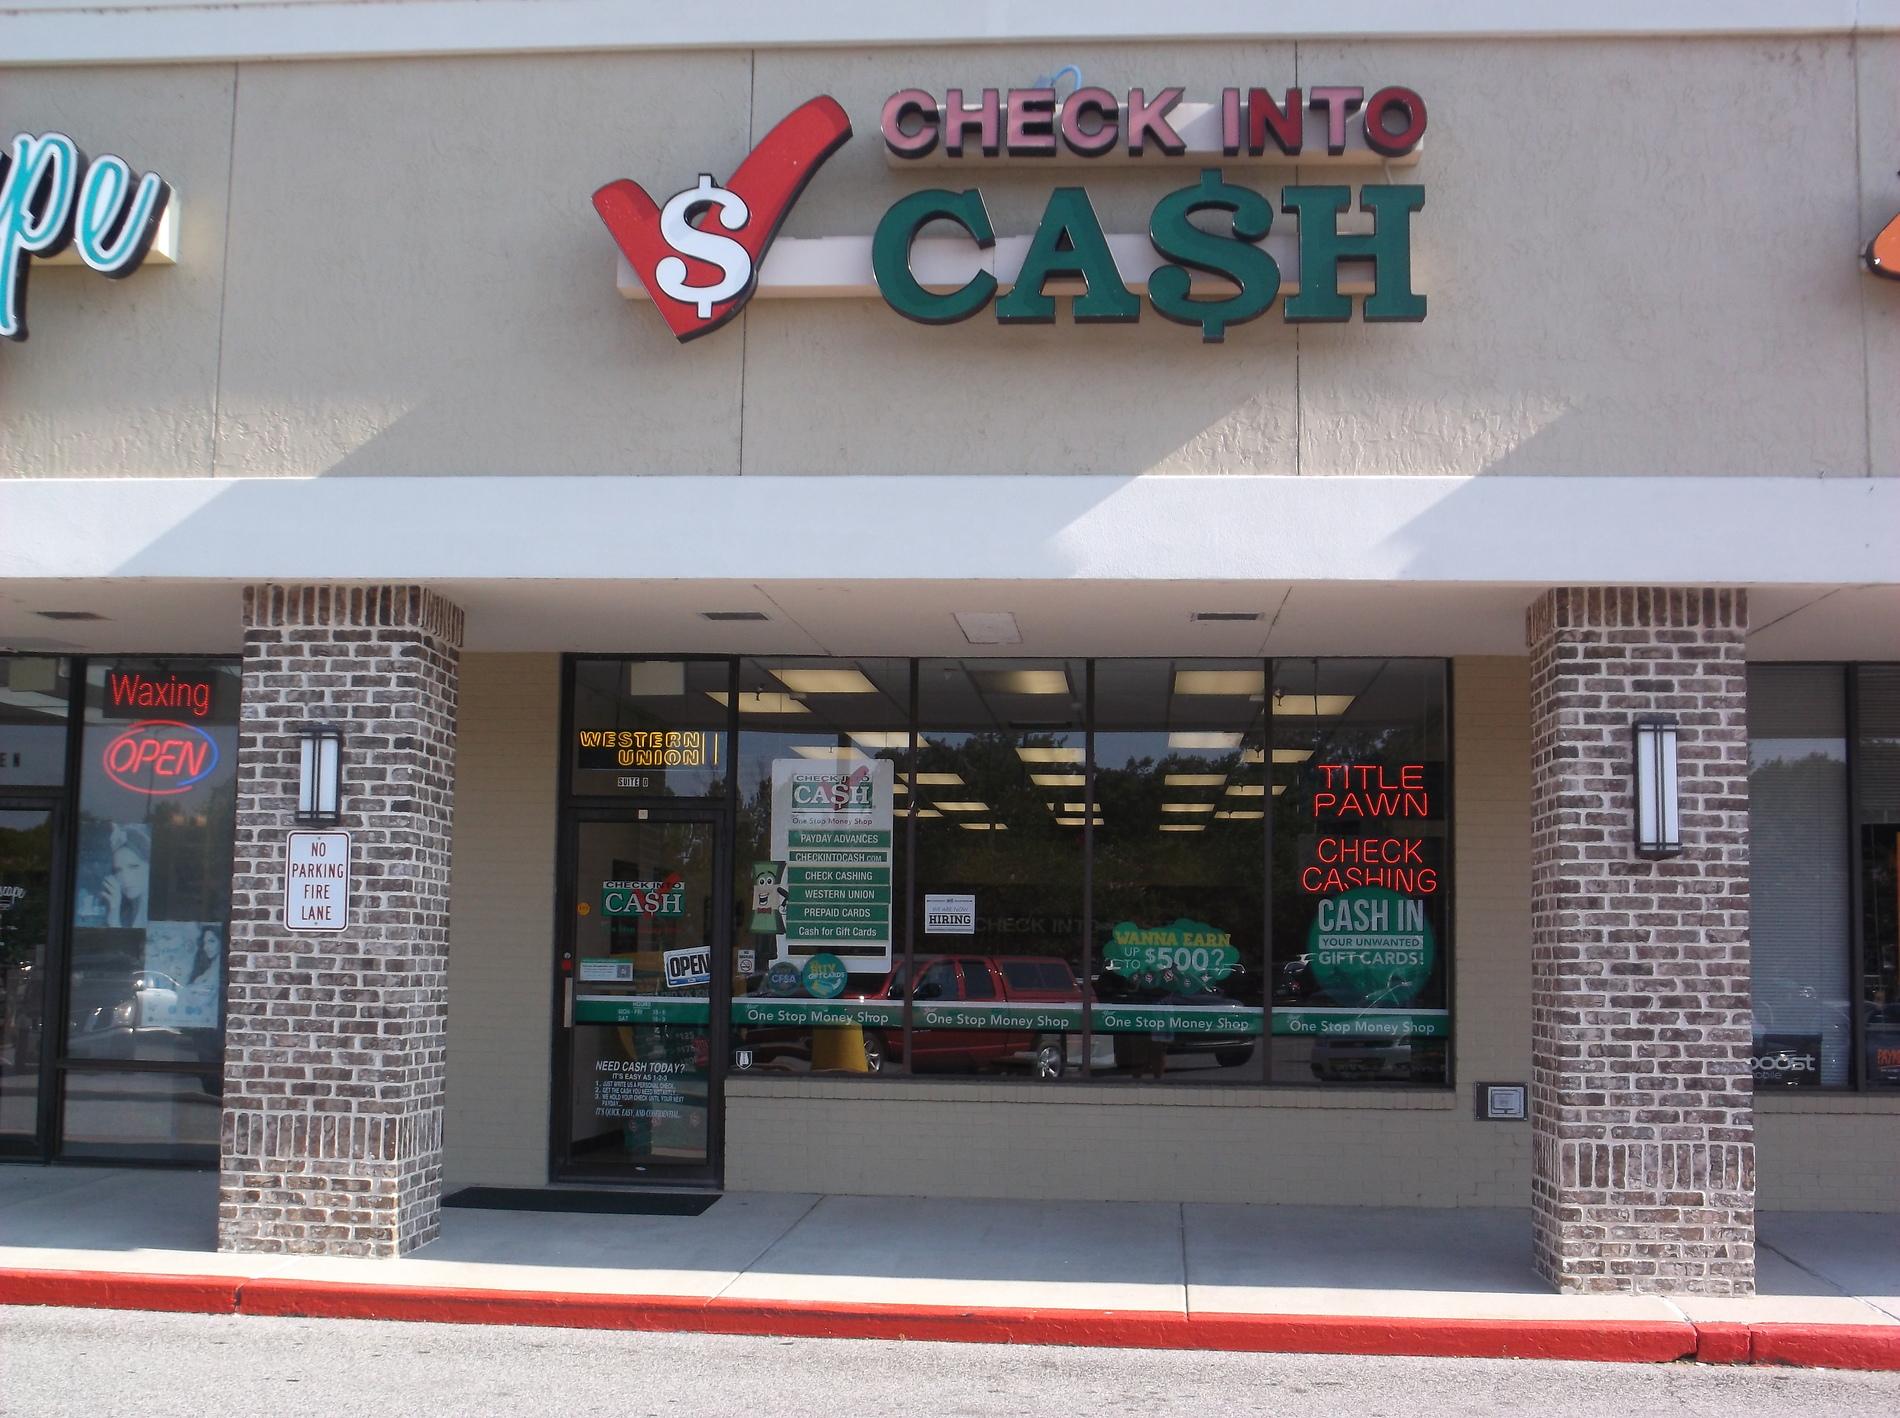 Refinance cash converters loan image 10